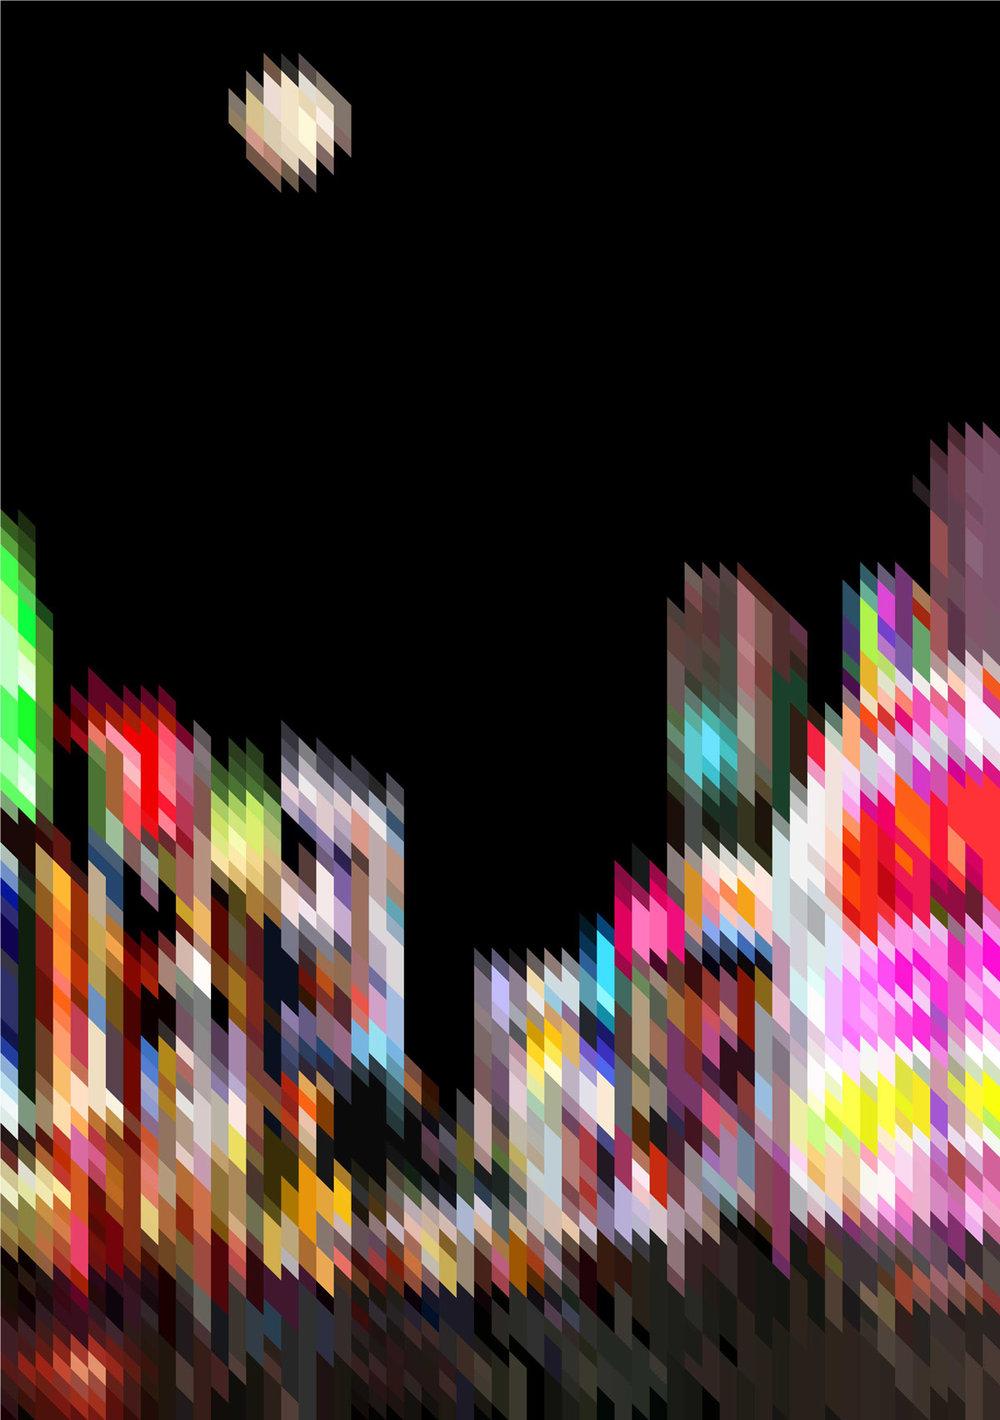 CITY_1_2_s.jpg